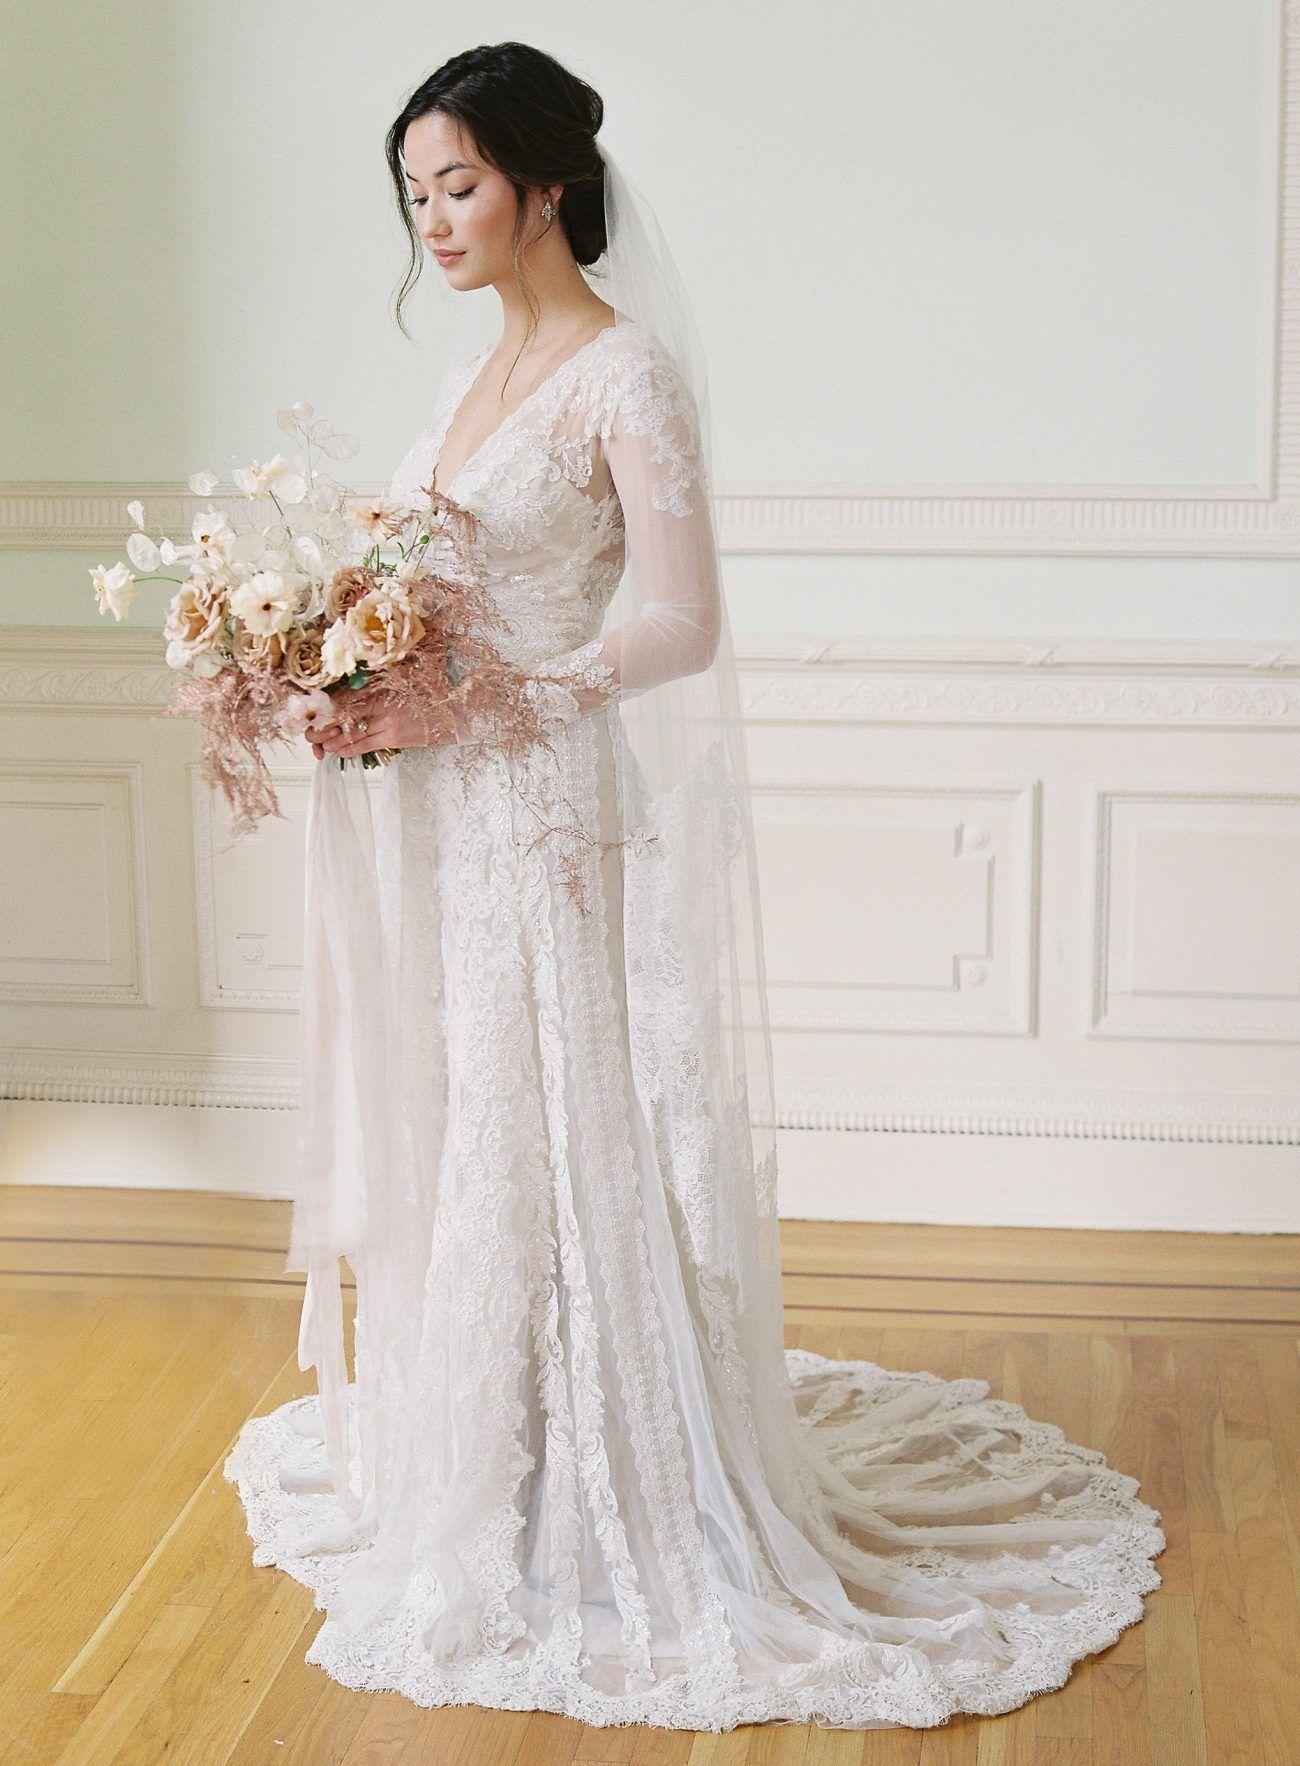 Stunning Romantic Vintage Inspired Wedding Dress By Melissa